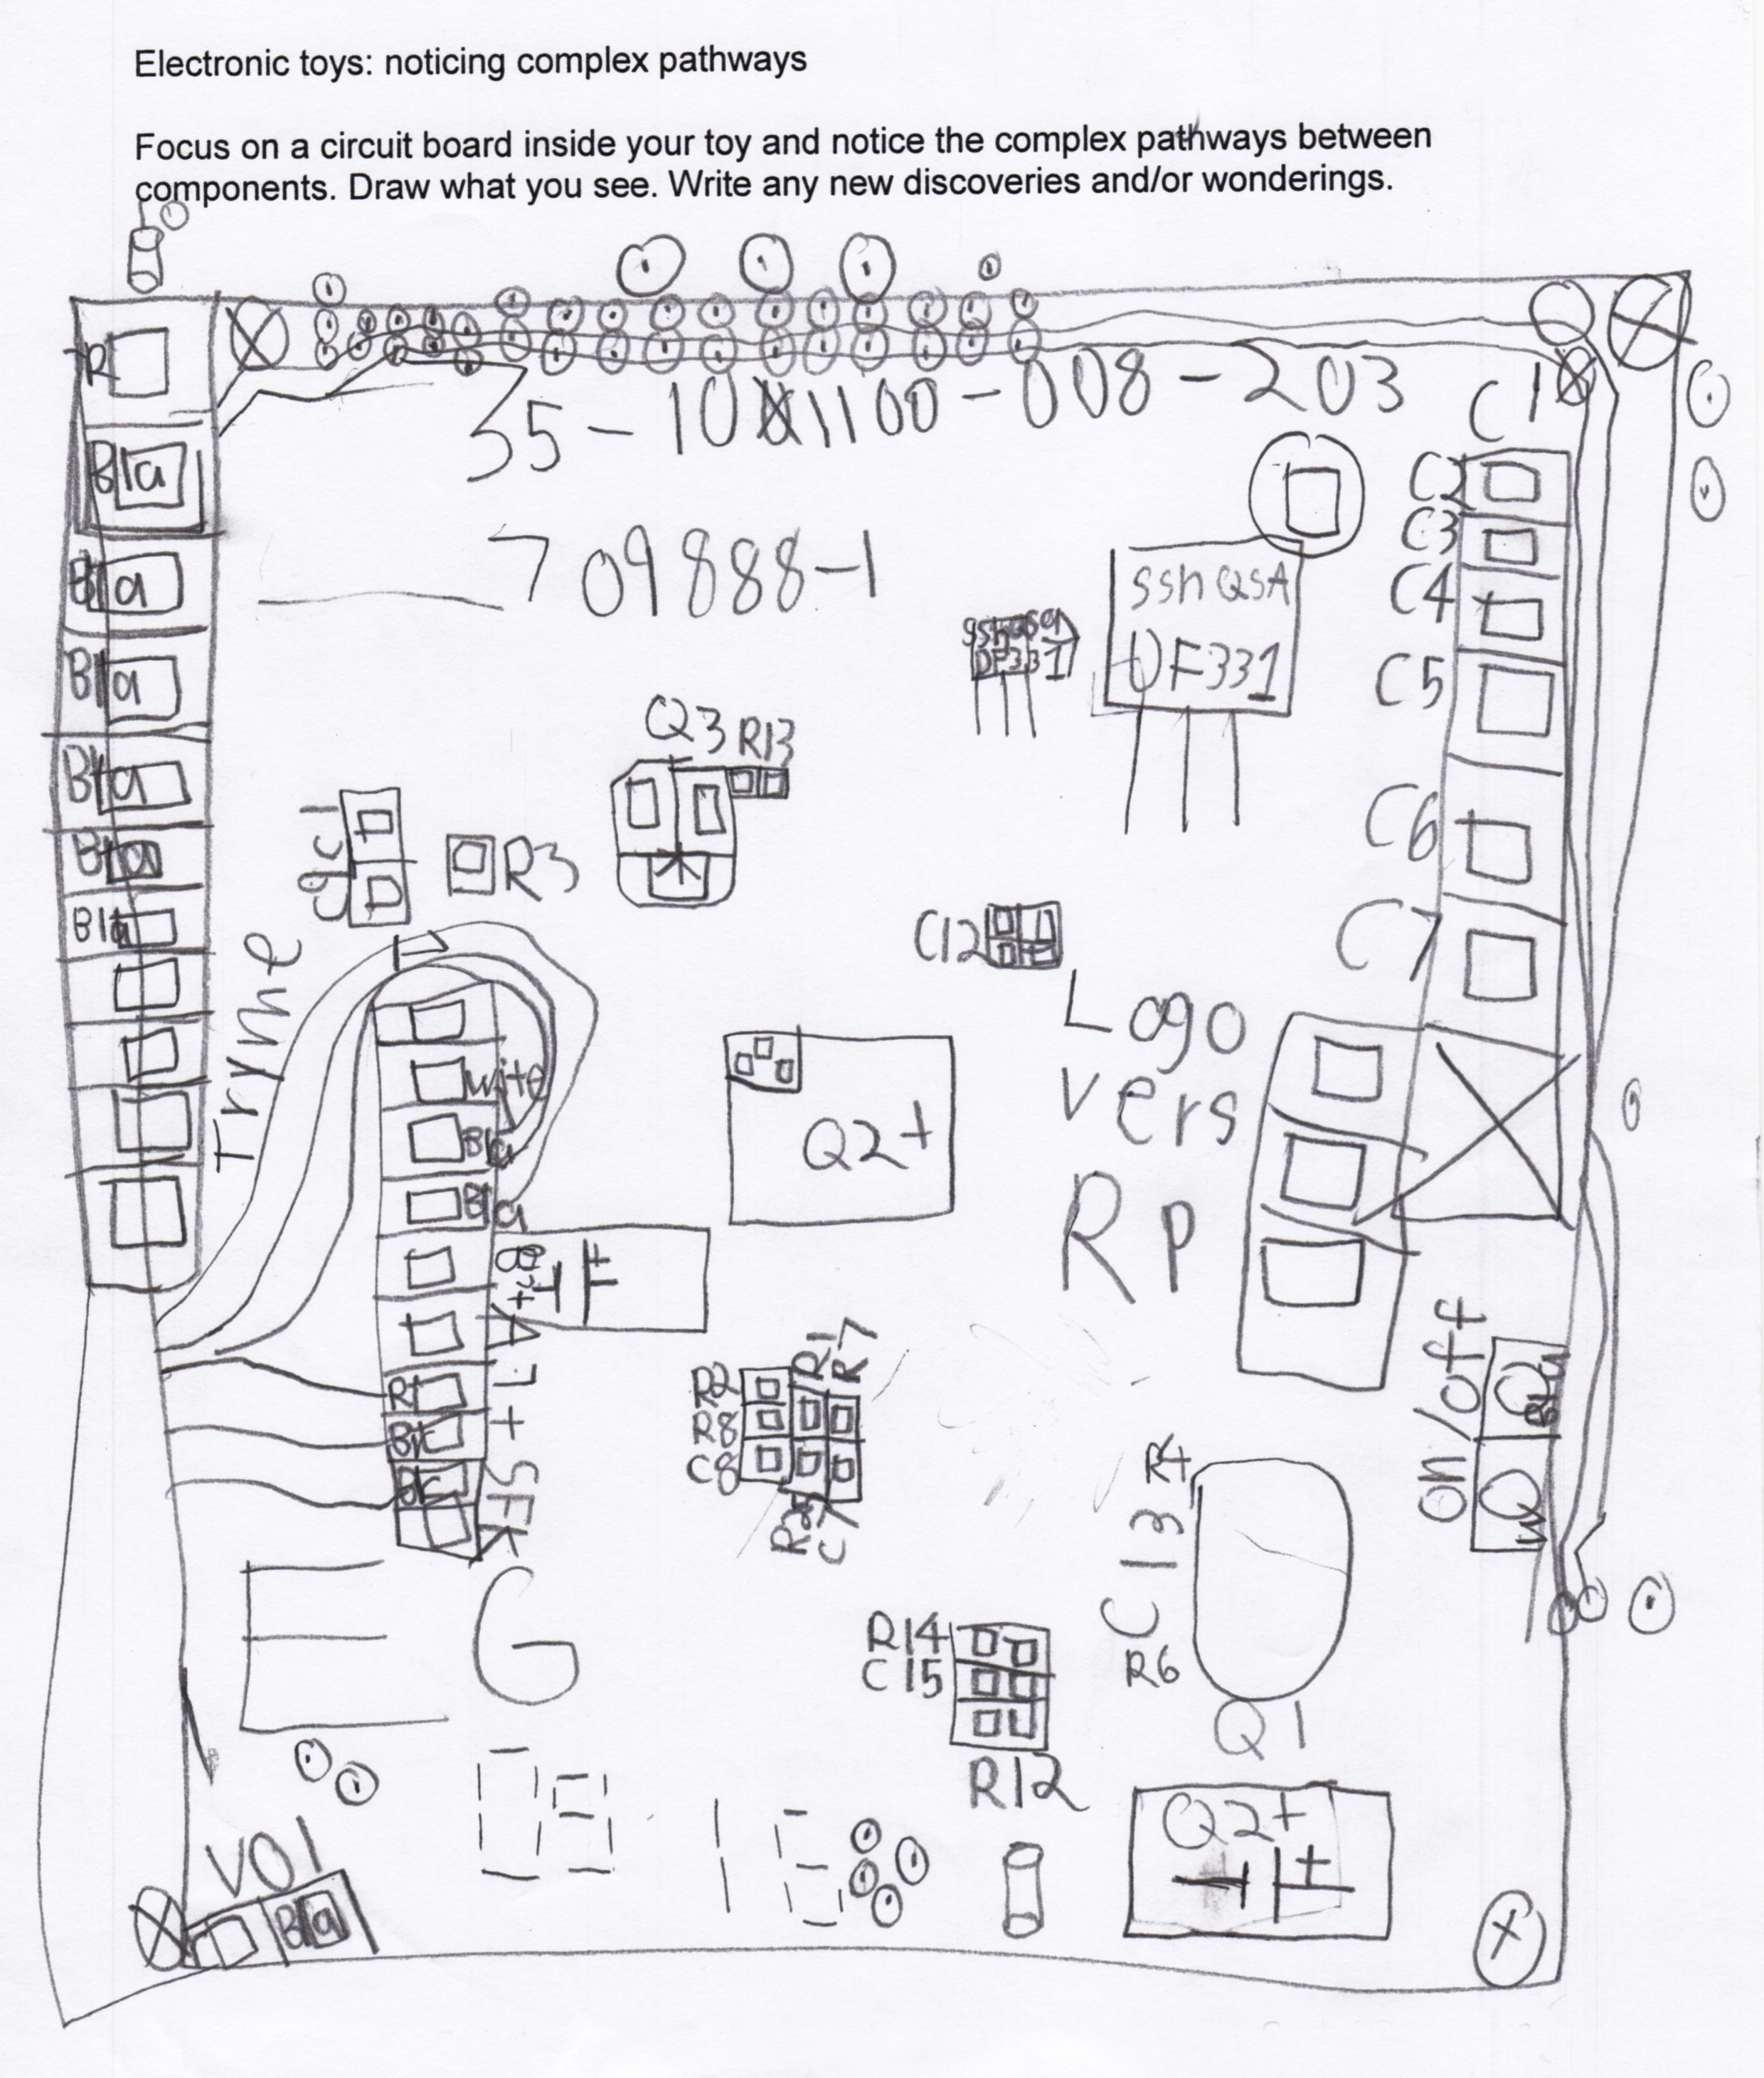 9.circuitboardintoy.jpg